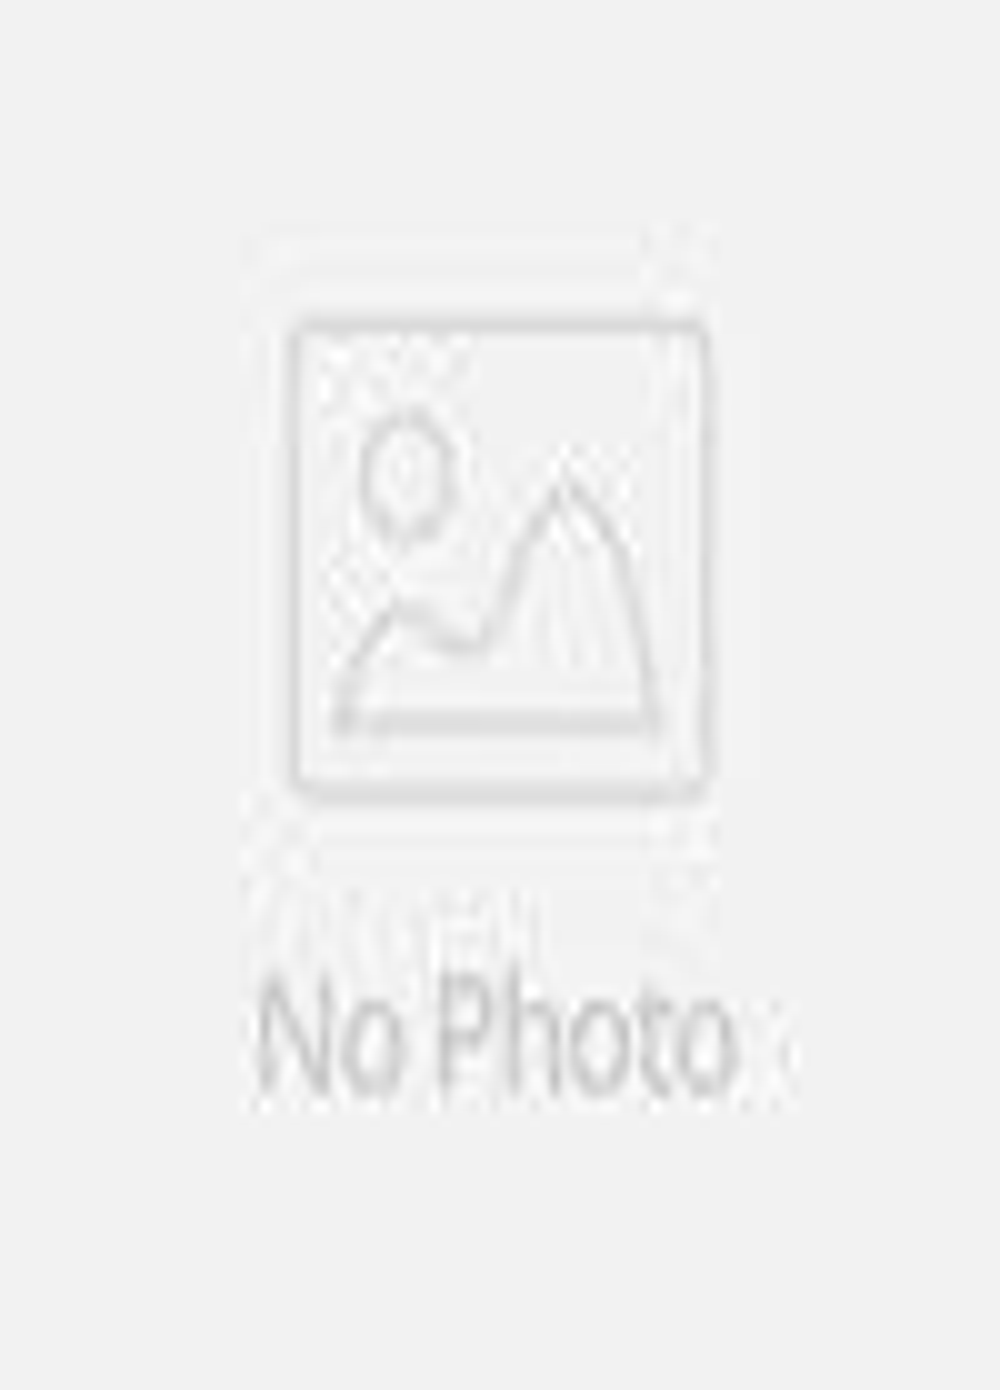 2014 Mature Bride Wedding Dresses A Line Bridal Gown Cheap Price ...